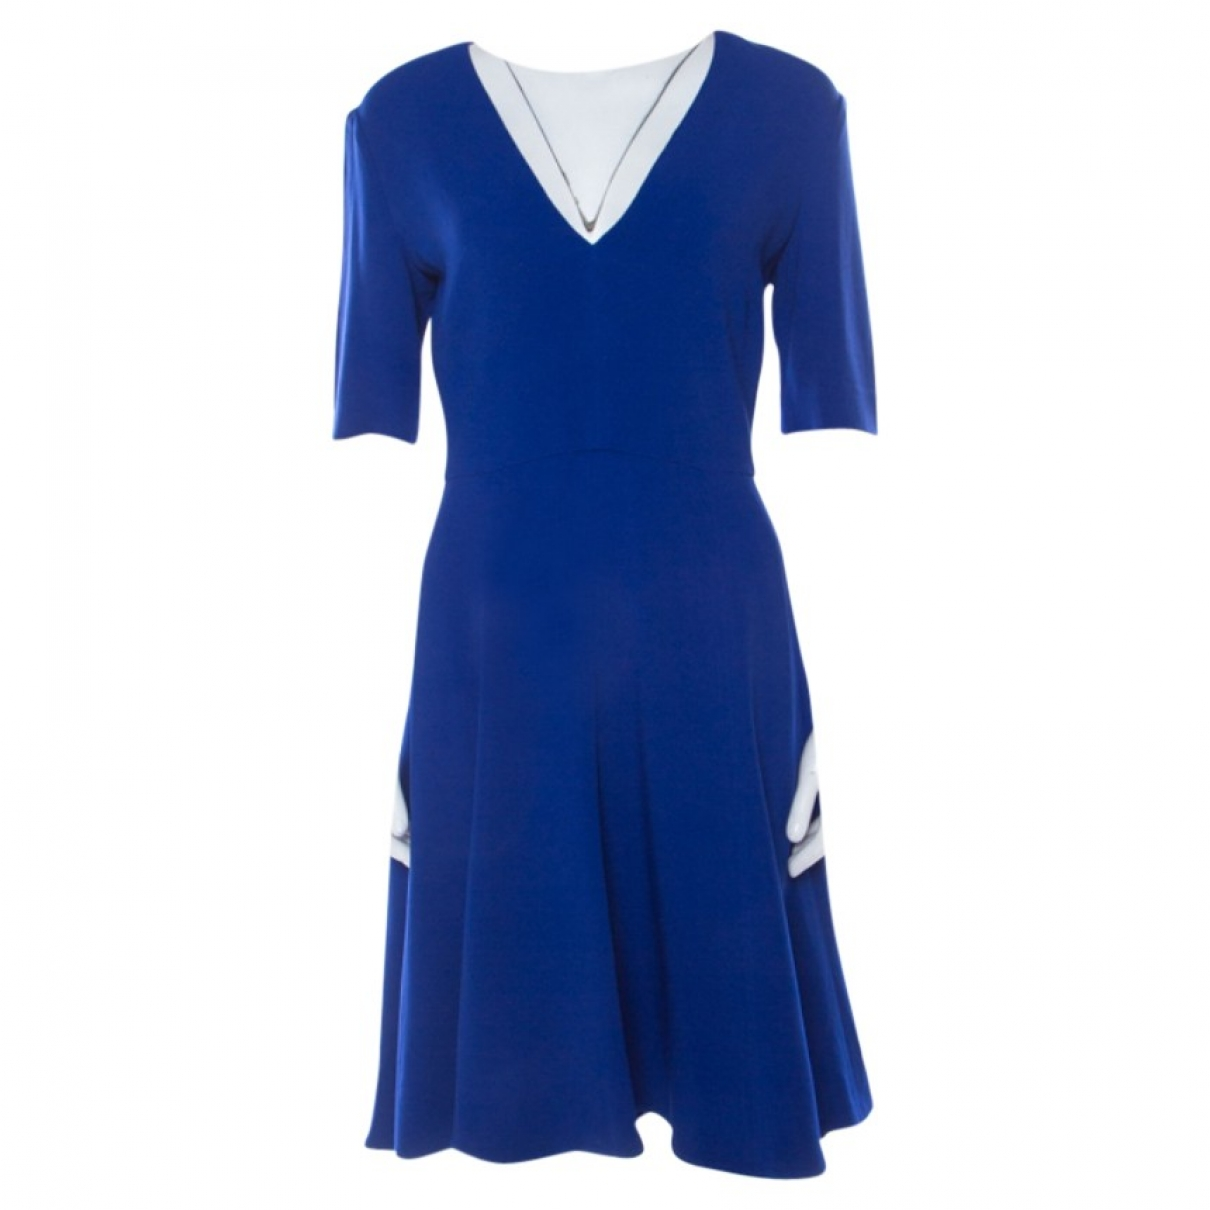 Stella Mccartney \N Blue dress for Women S International